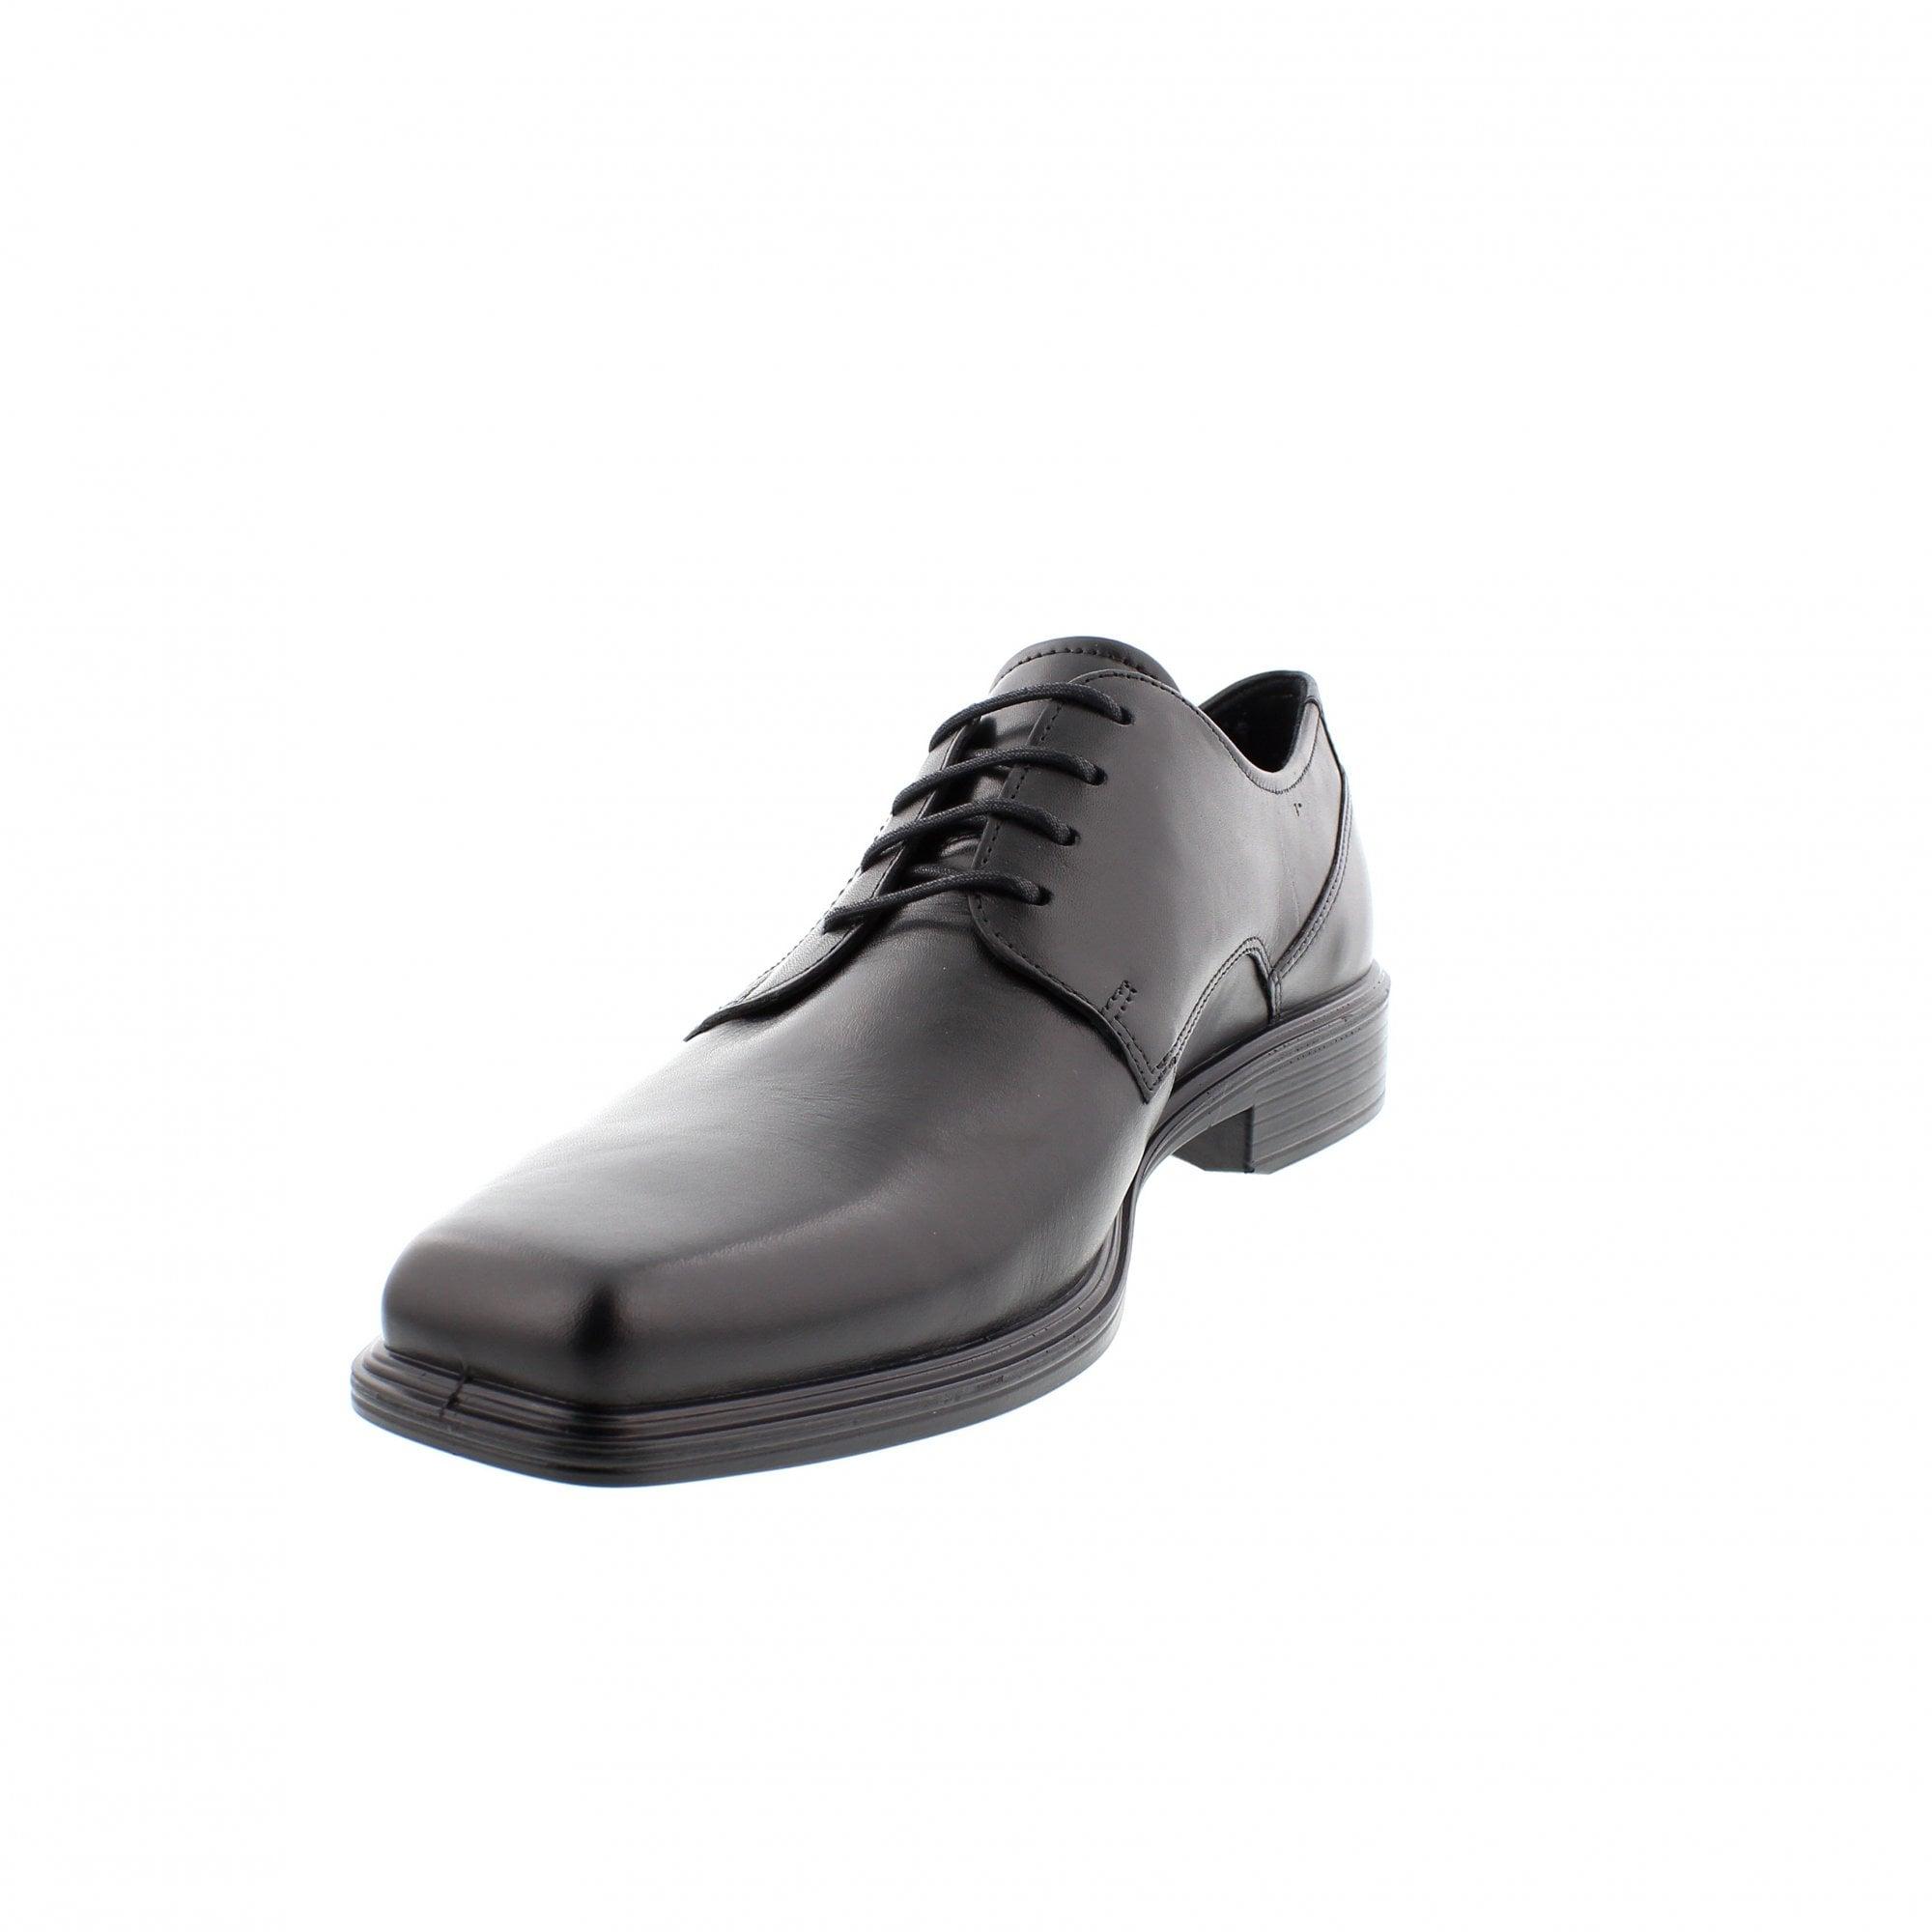 74560cd5cf71 Ecco Johannesburg 623534-01001 Mens Shoes